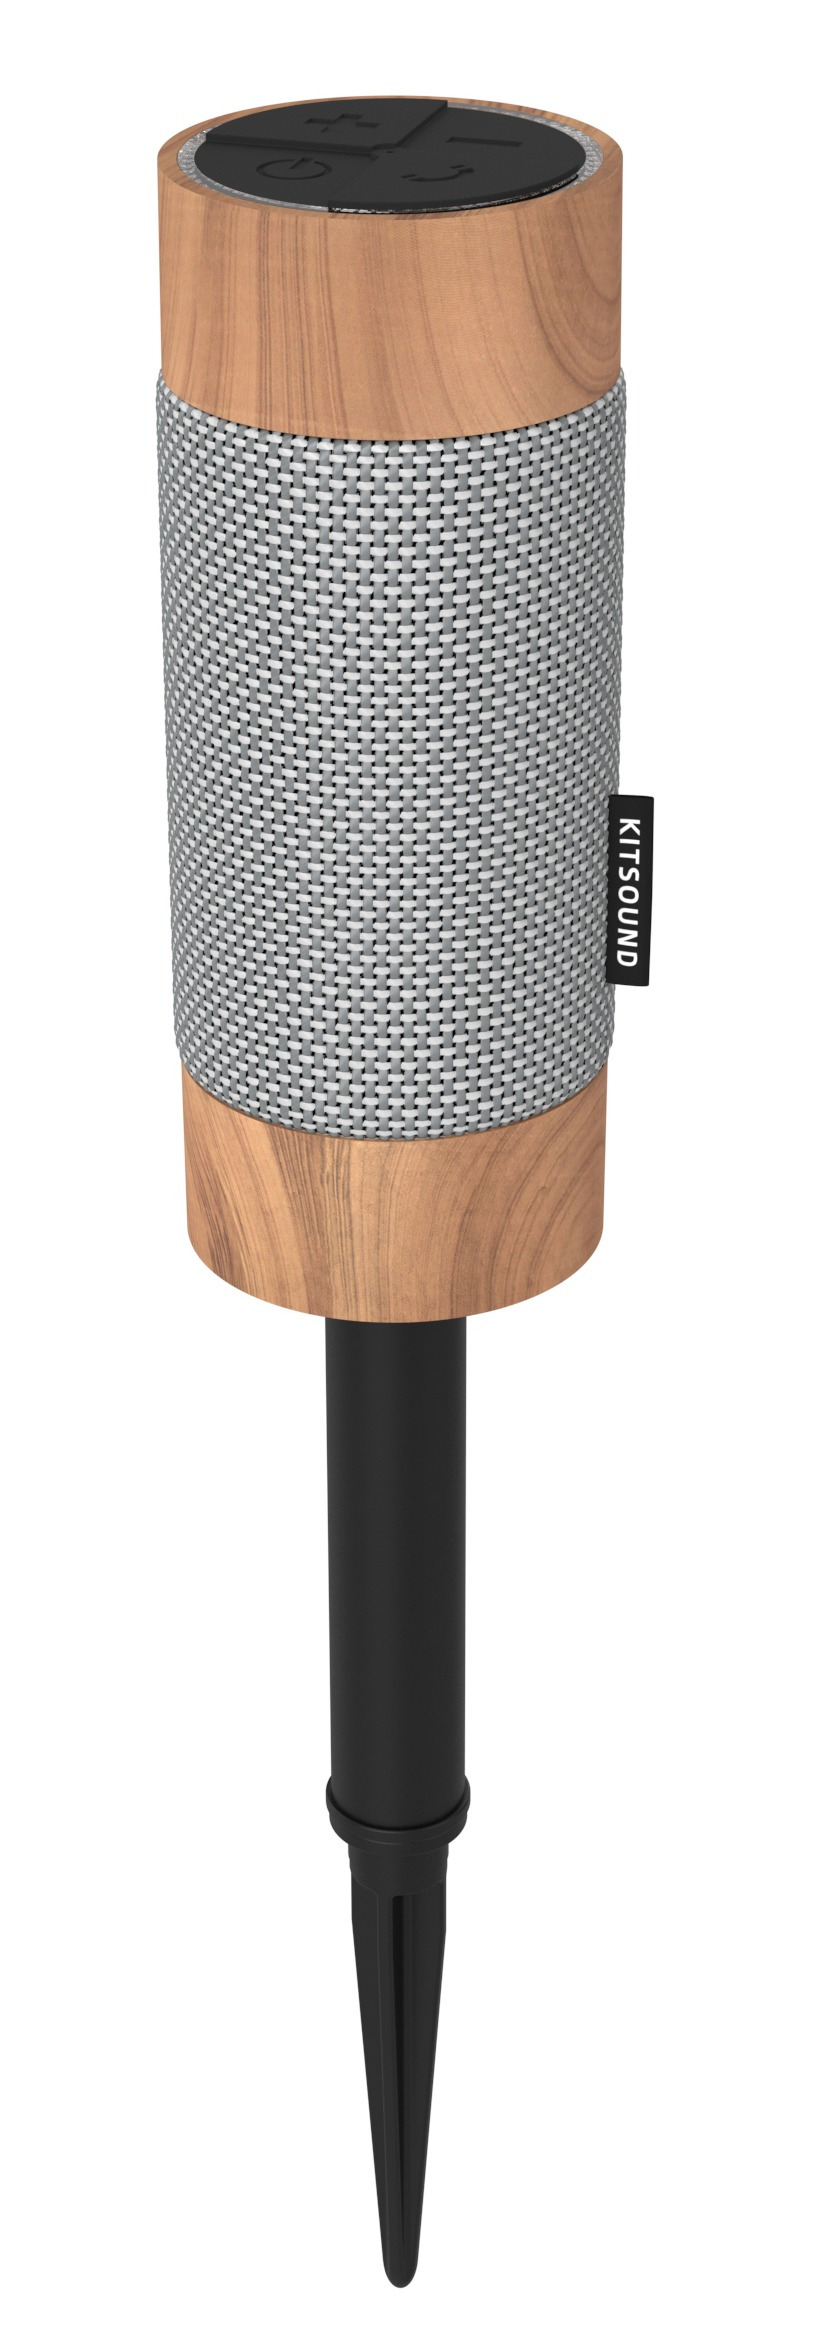 KitSound Diggit Bluetooth outdoor speaker, £39.99, kitsound.co.uk